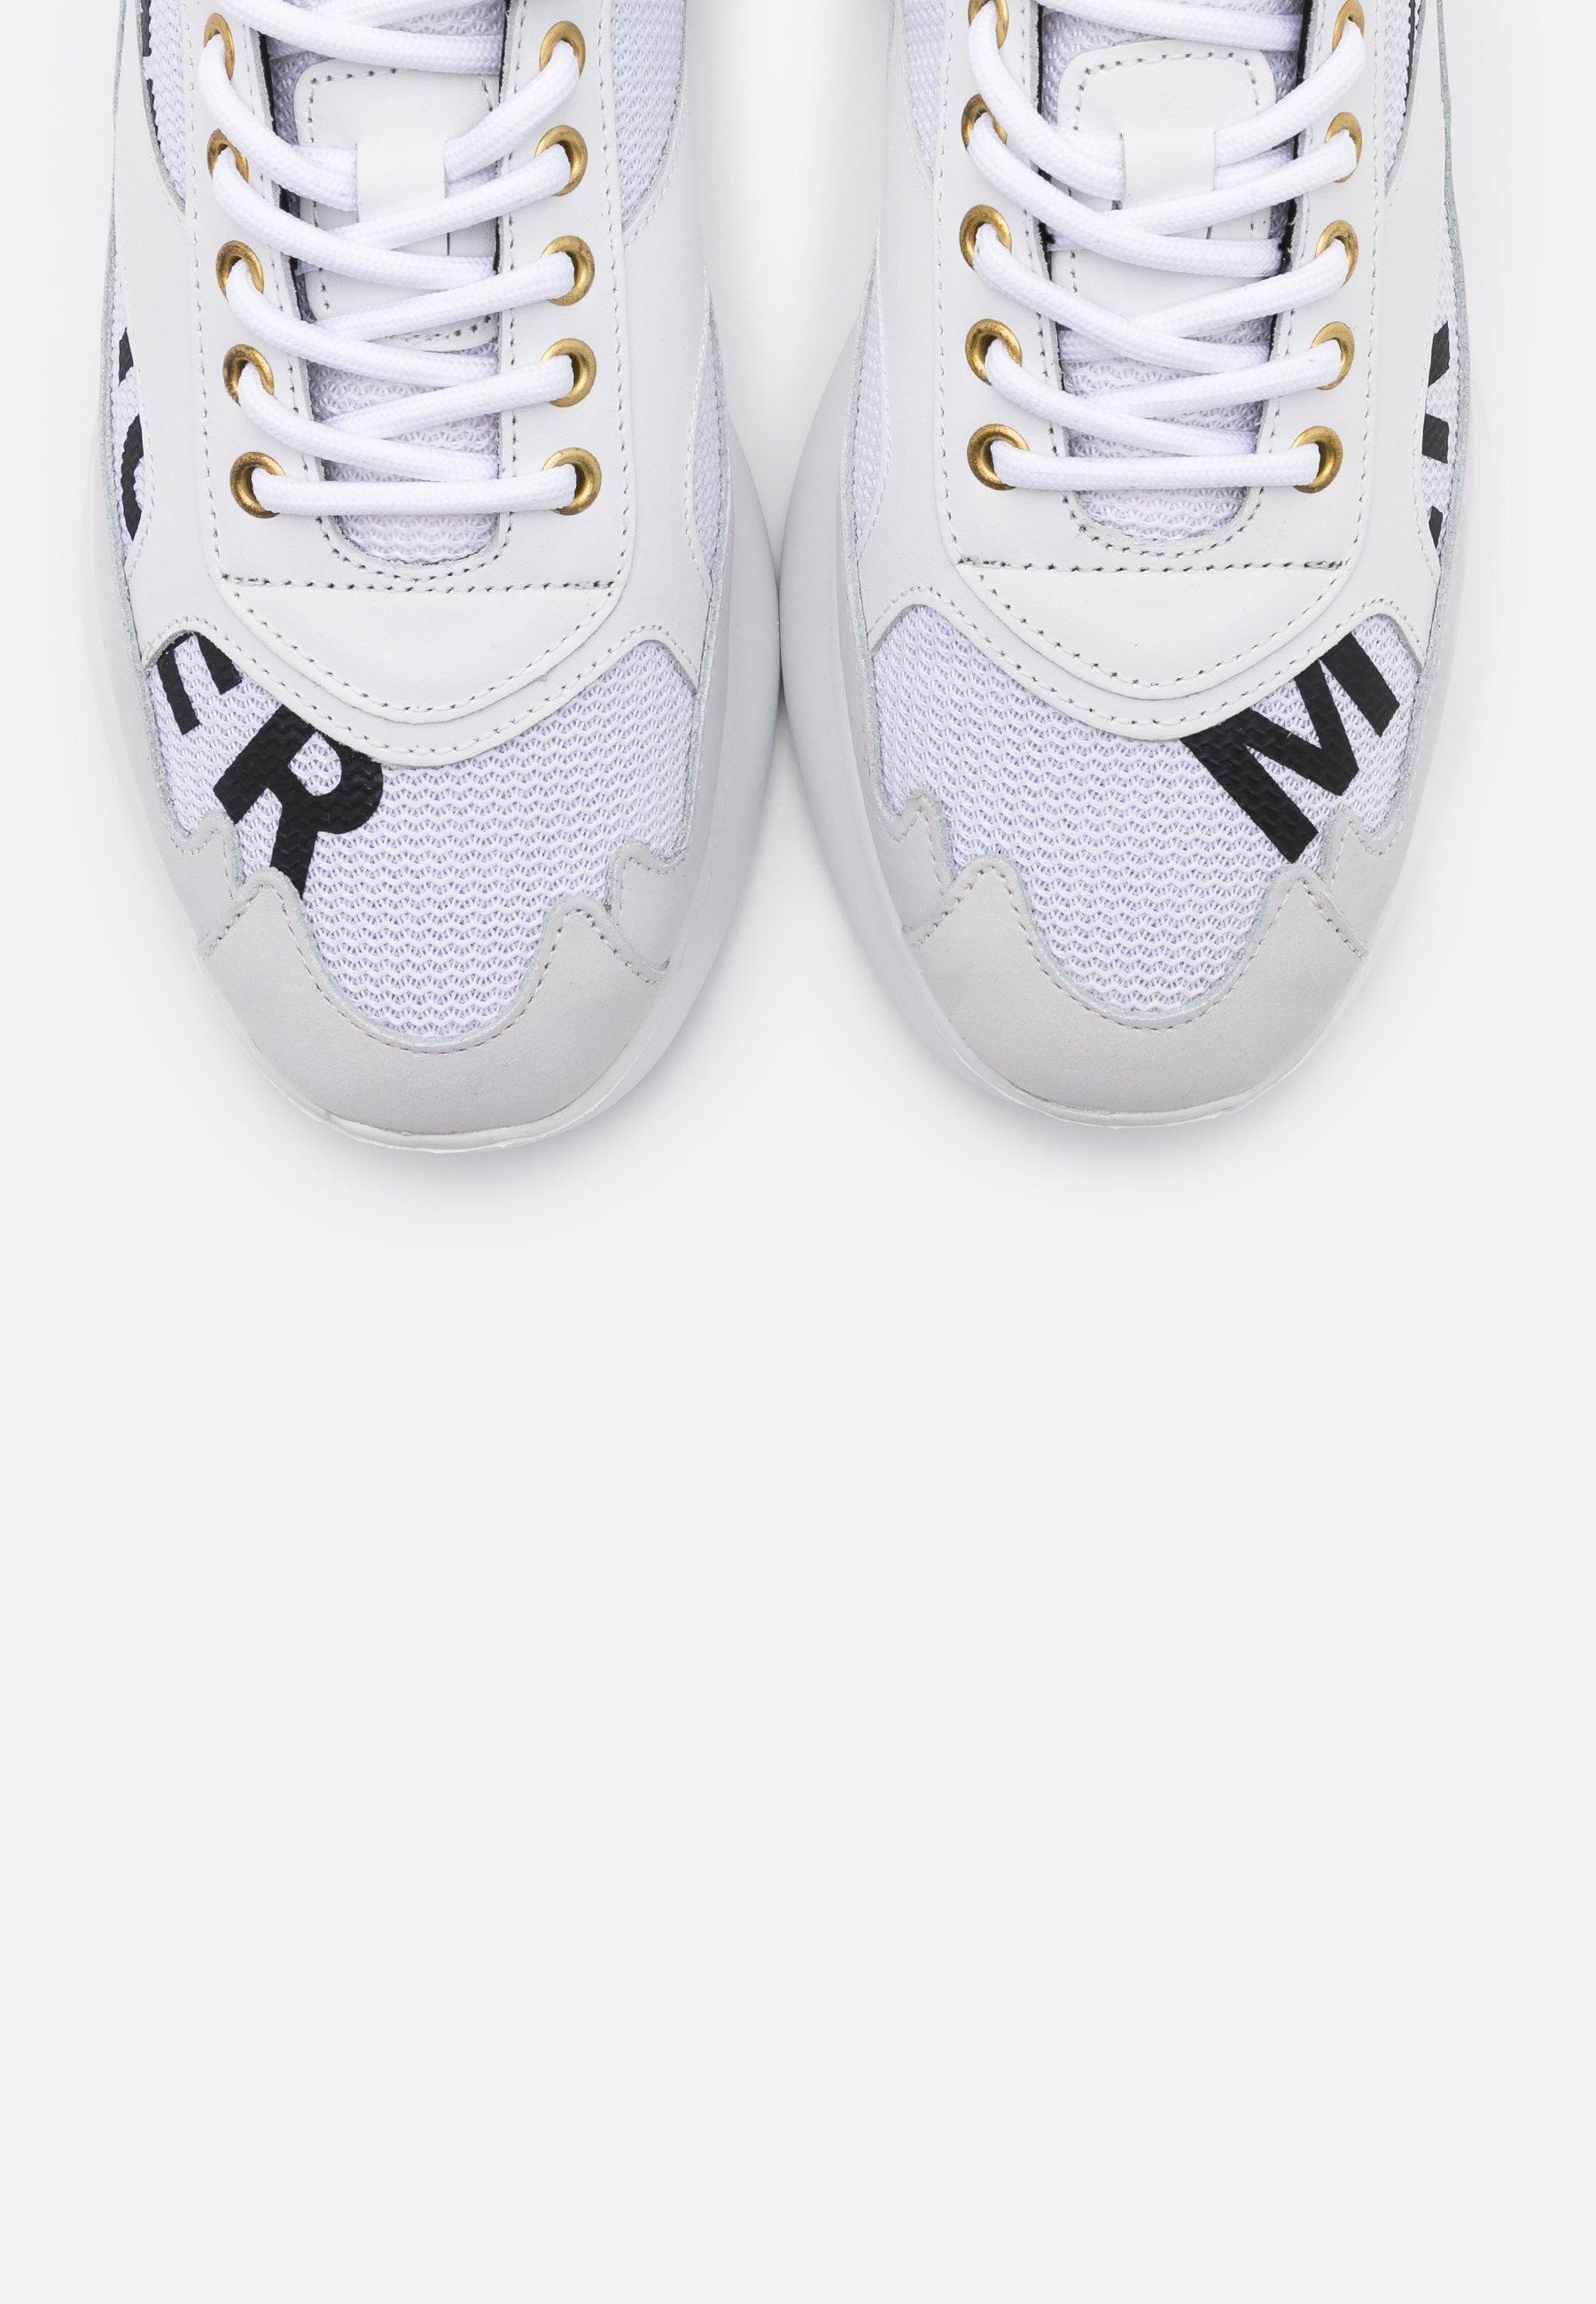 For Cheap Women's Shoes Mercer Amsterdam Trainers shattered ot7SIwQbw